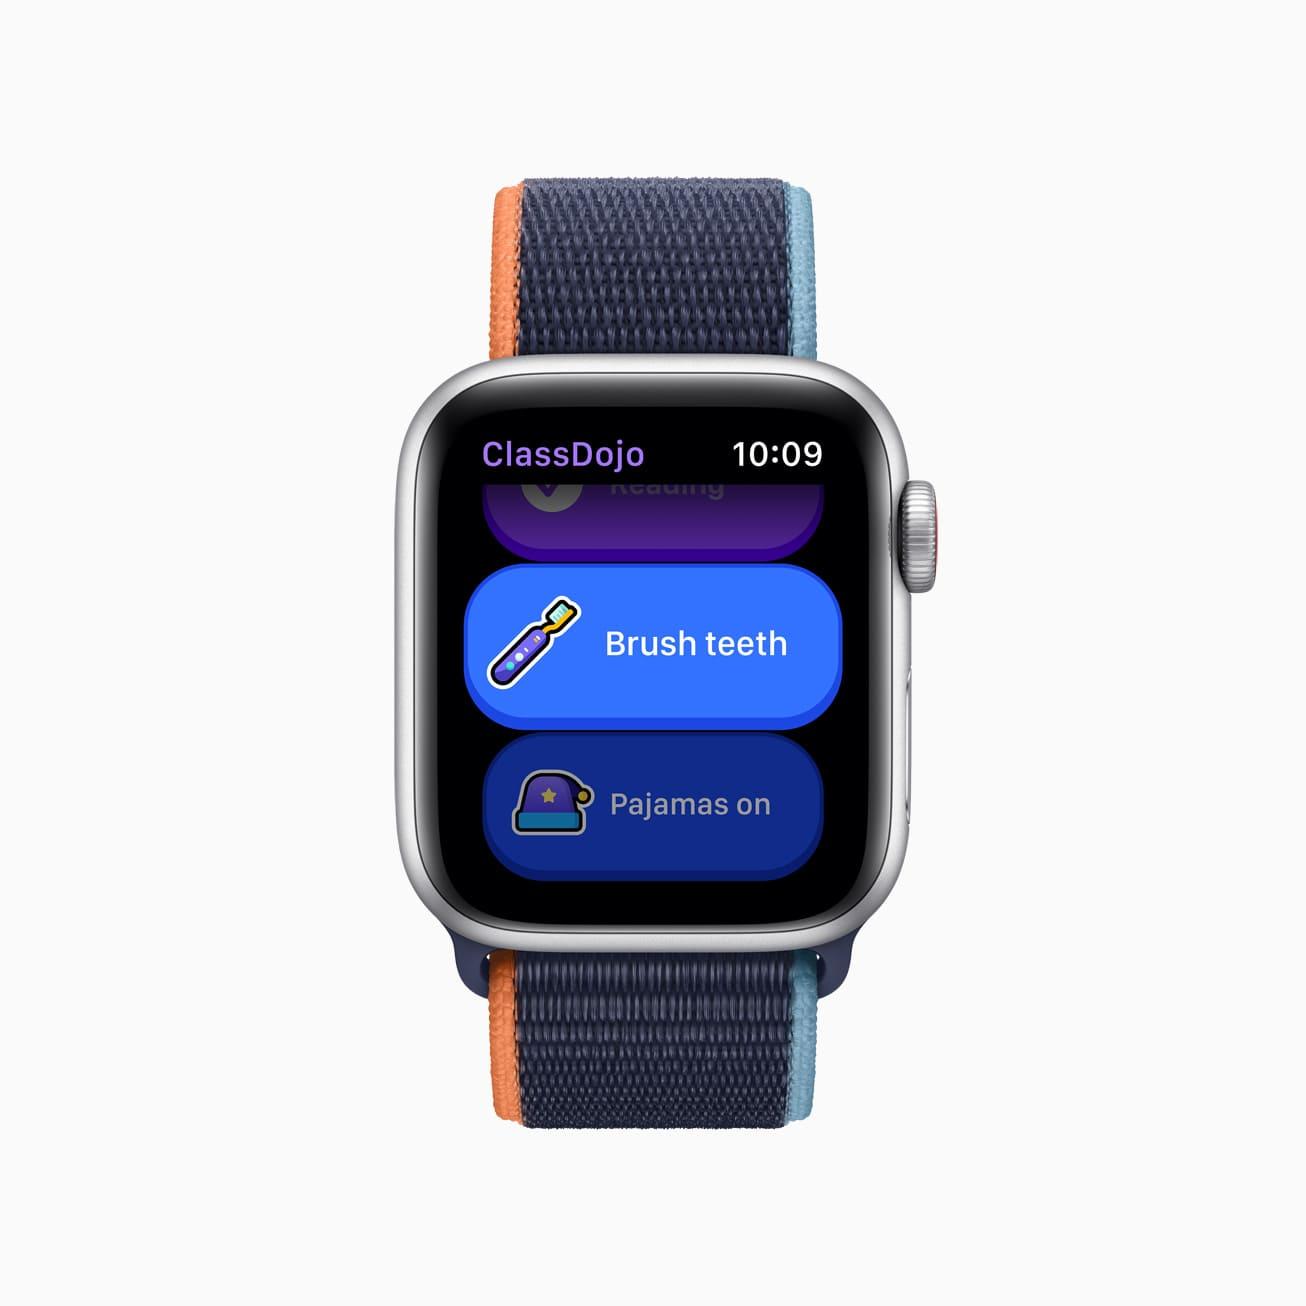 watch-third-party-app-class-dojo